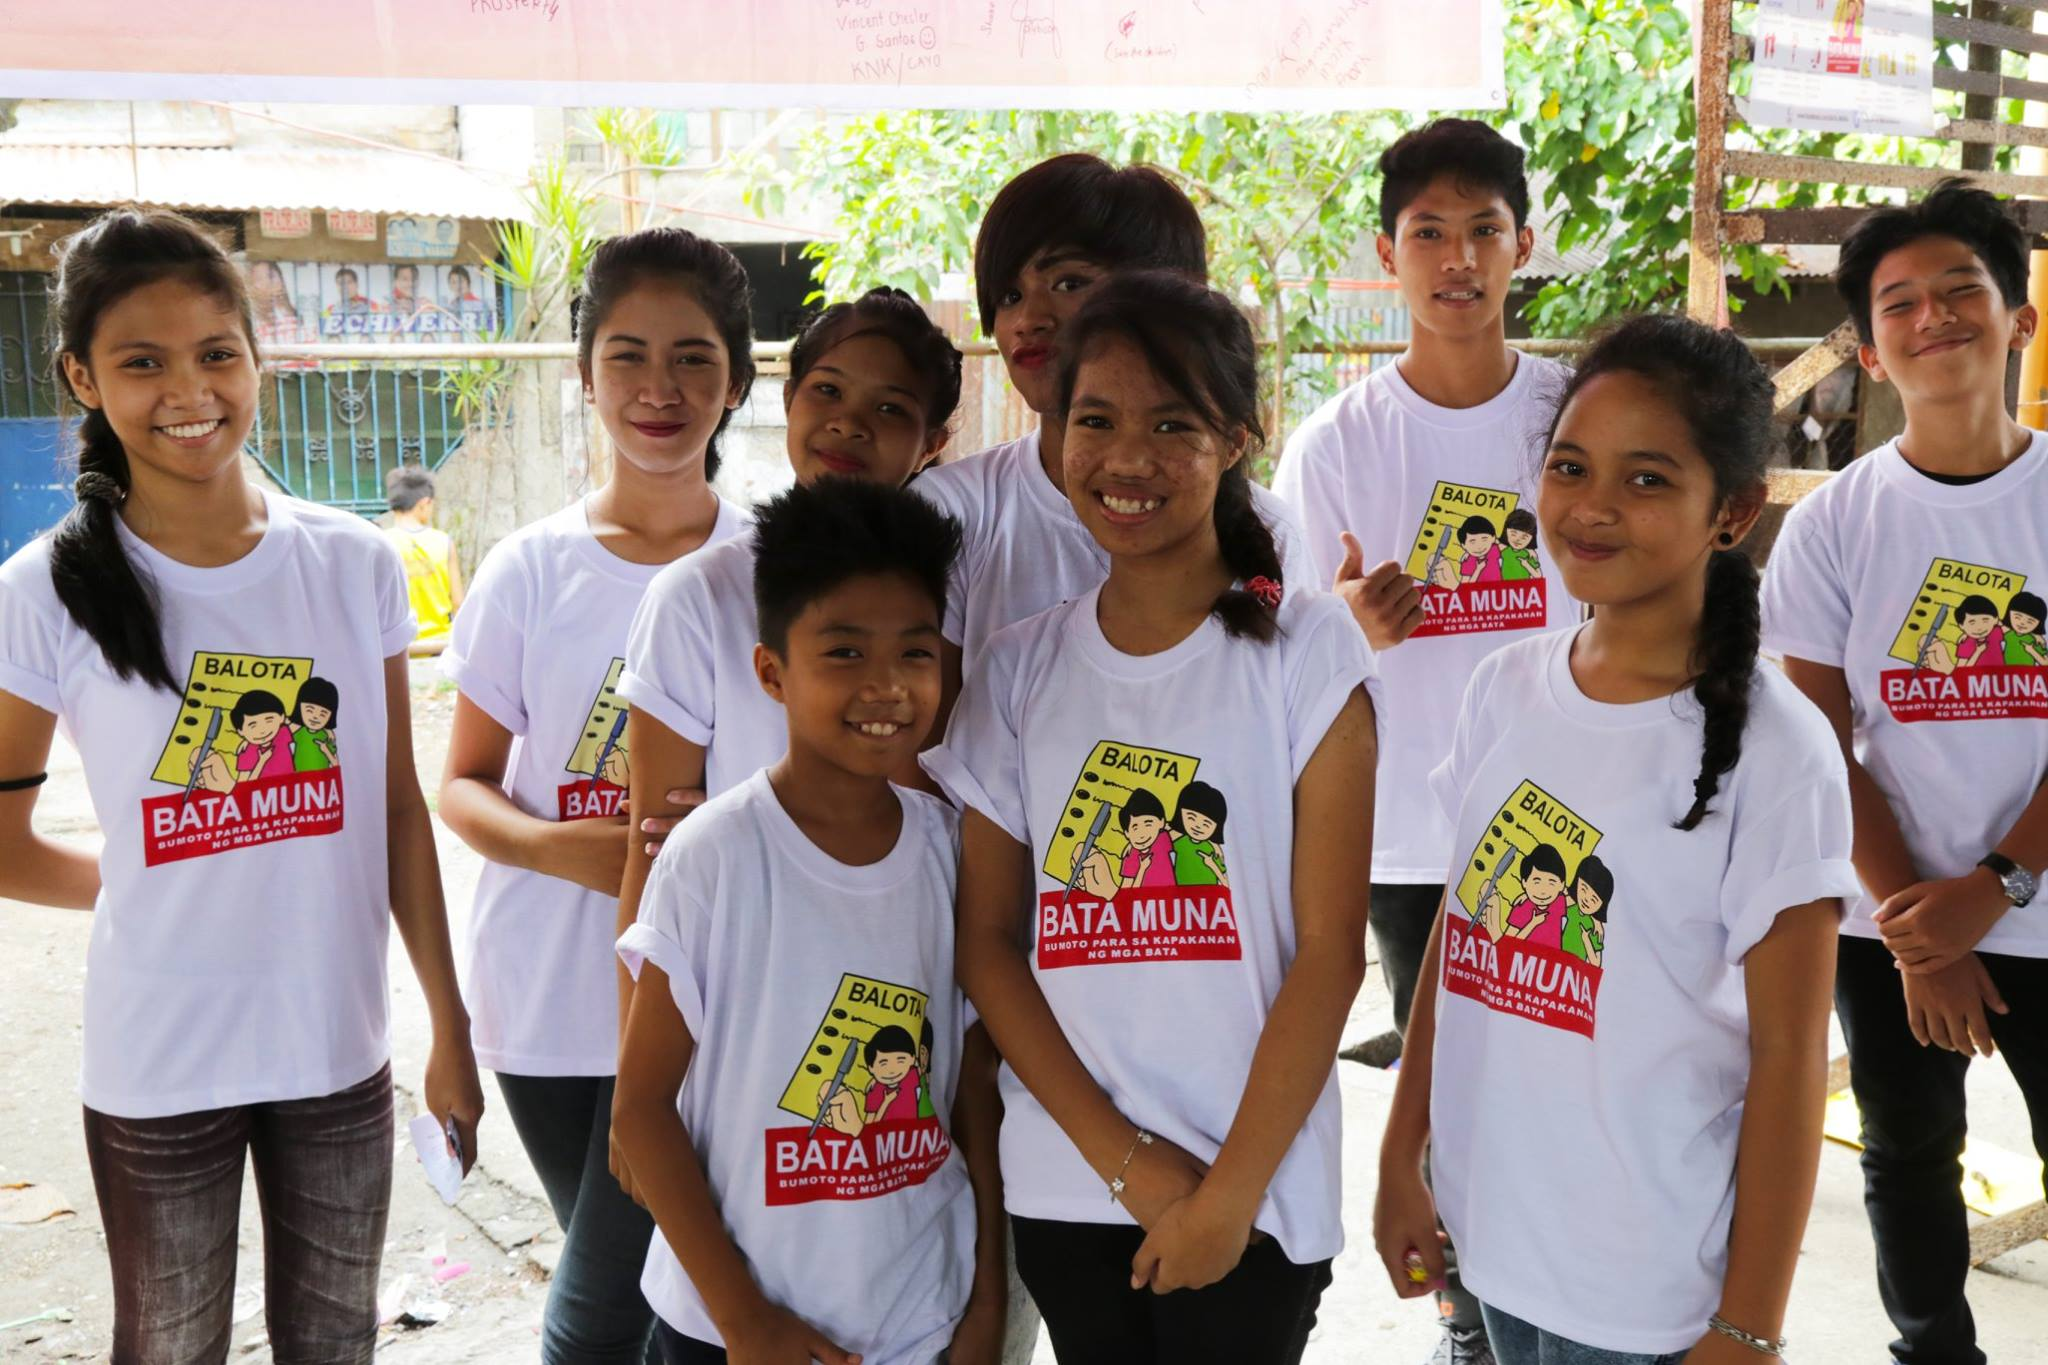 bata muna filipino children election 2016